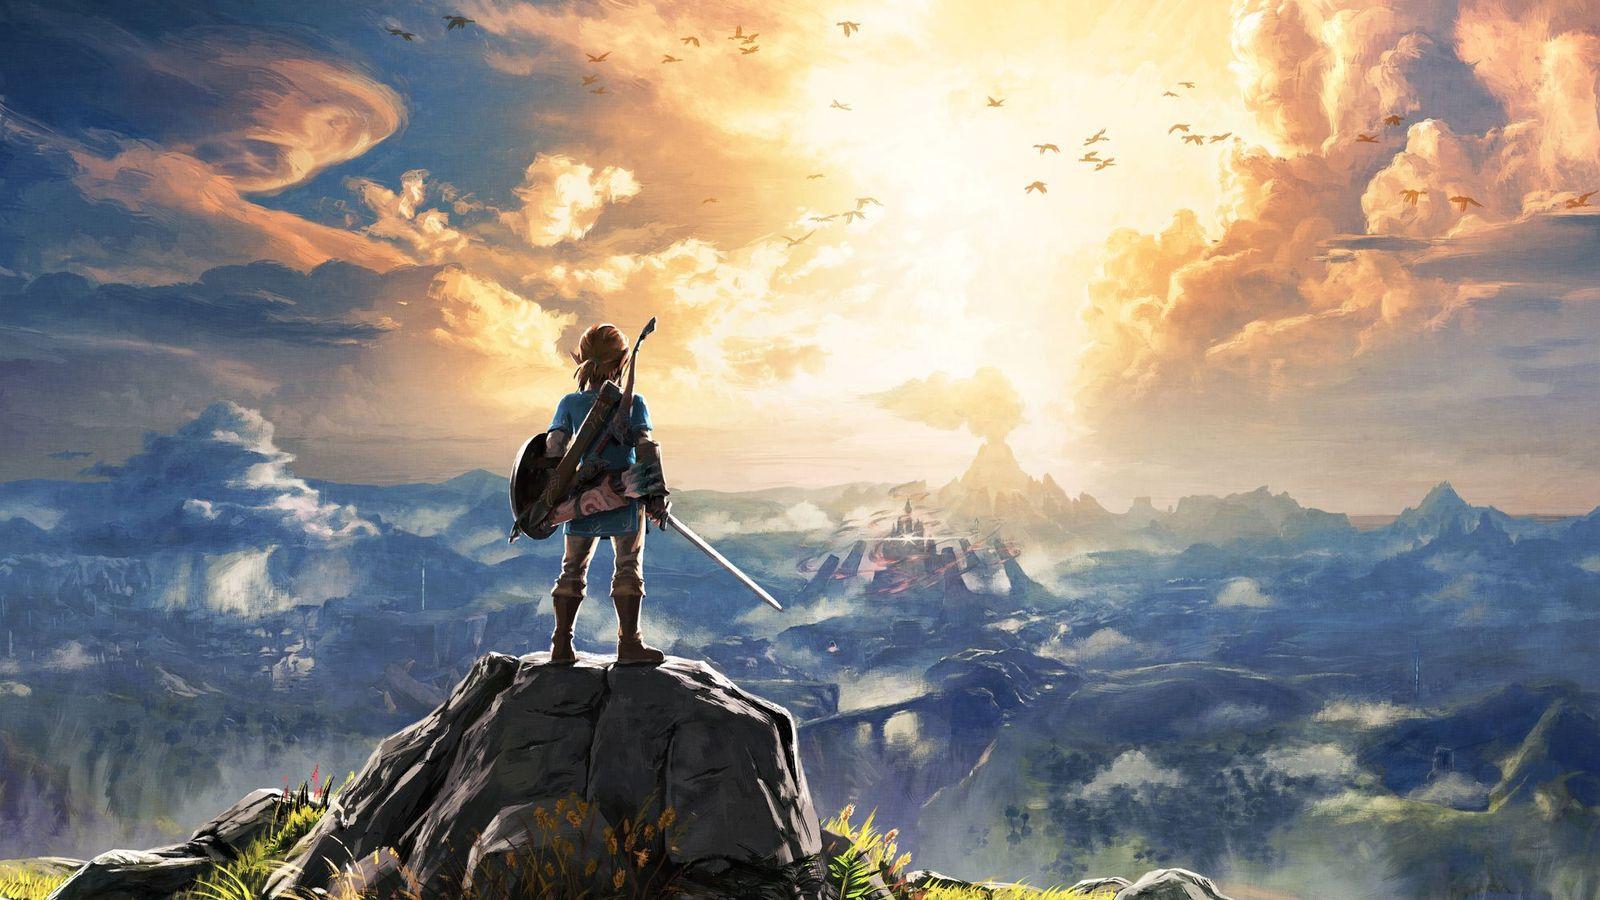 Photo of The Legend of Zelda: Breath of the Wild